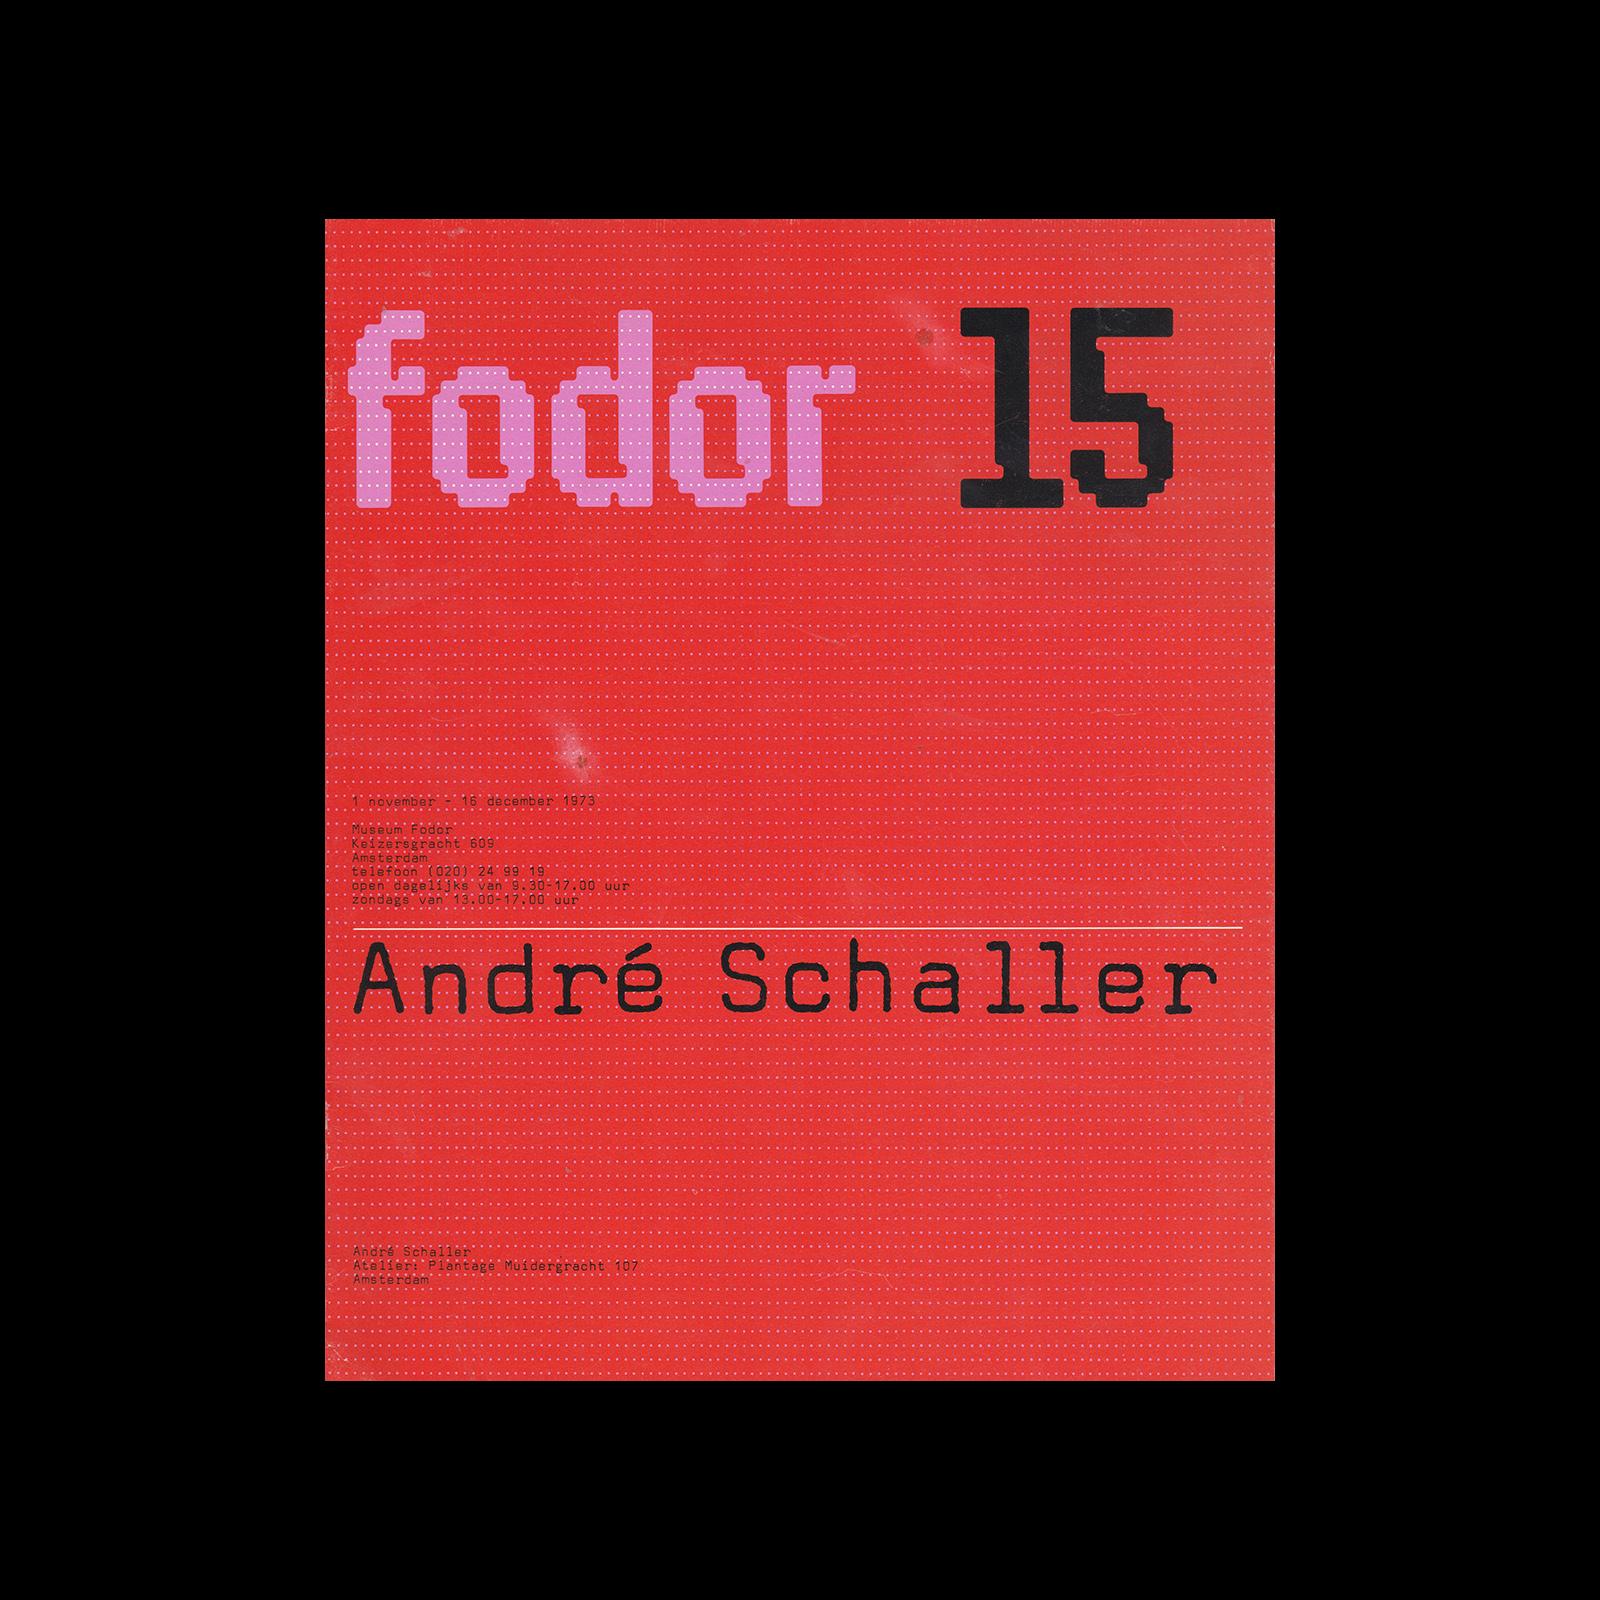 Fodor 15, 1973 - André Schaller. Designed by Wim Crouwel and Dapne Duijvelshoff (Total Design).